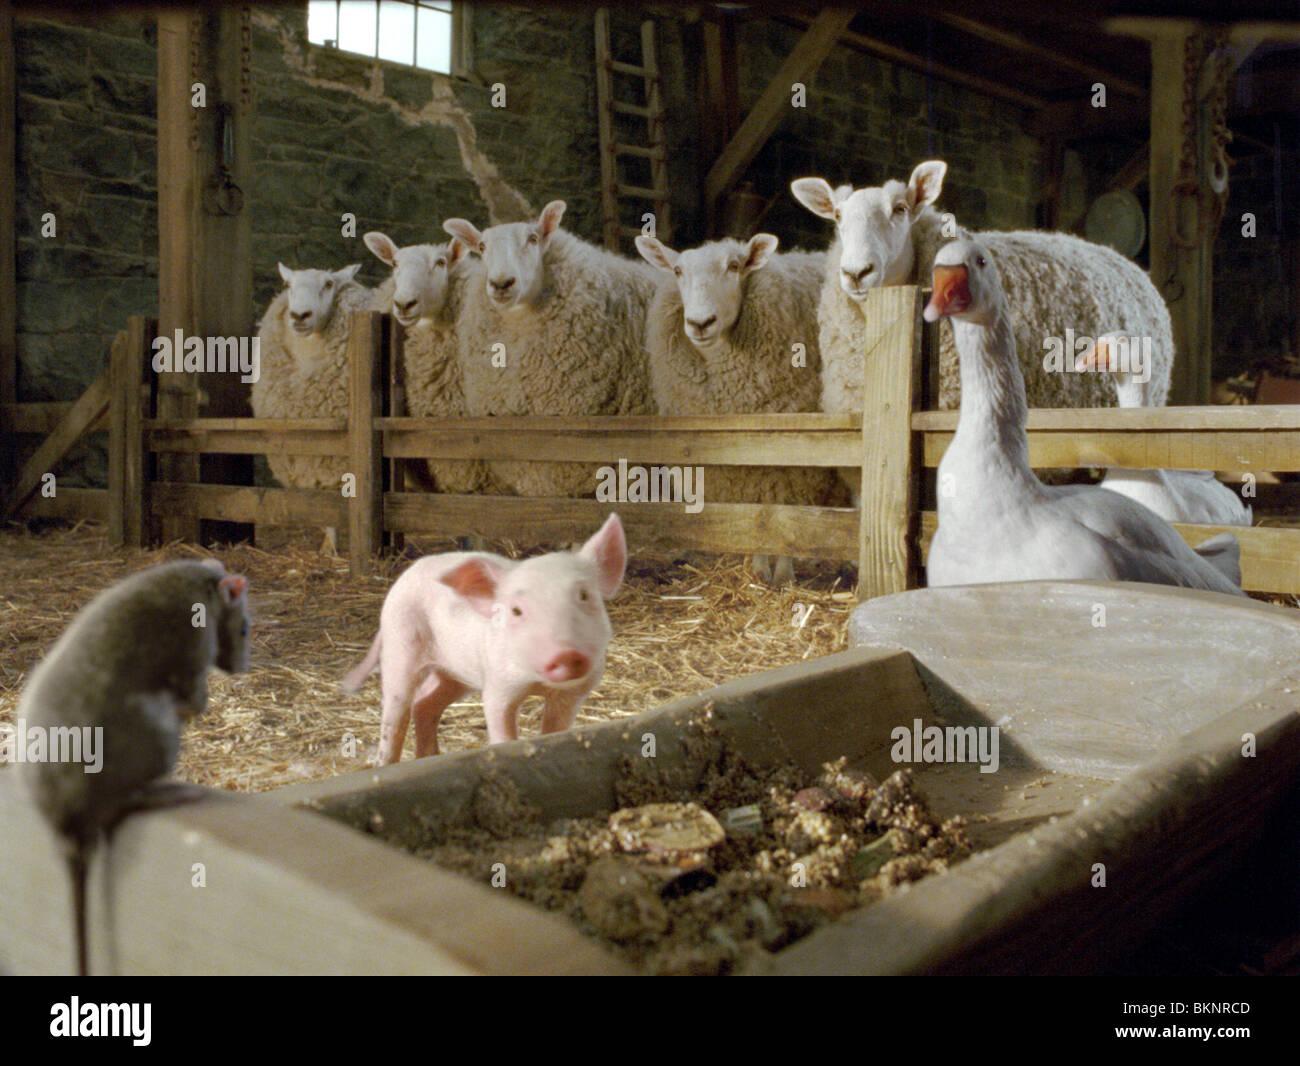 CHARLOTTE'S WEB -2007 - Stock Image